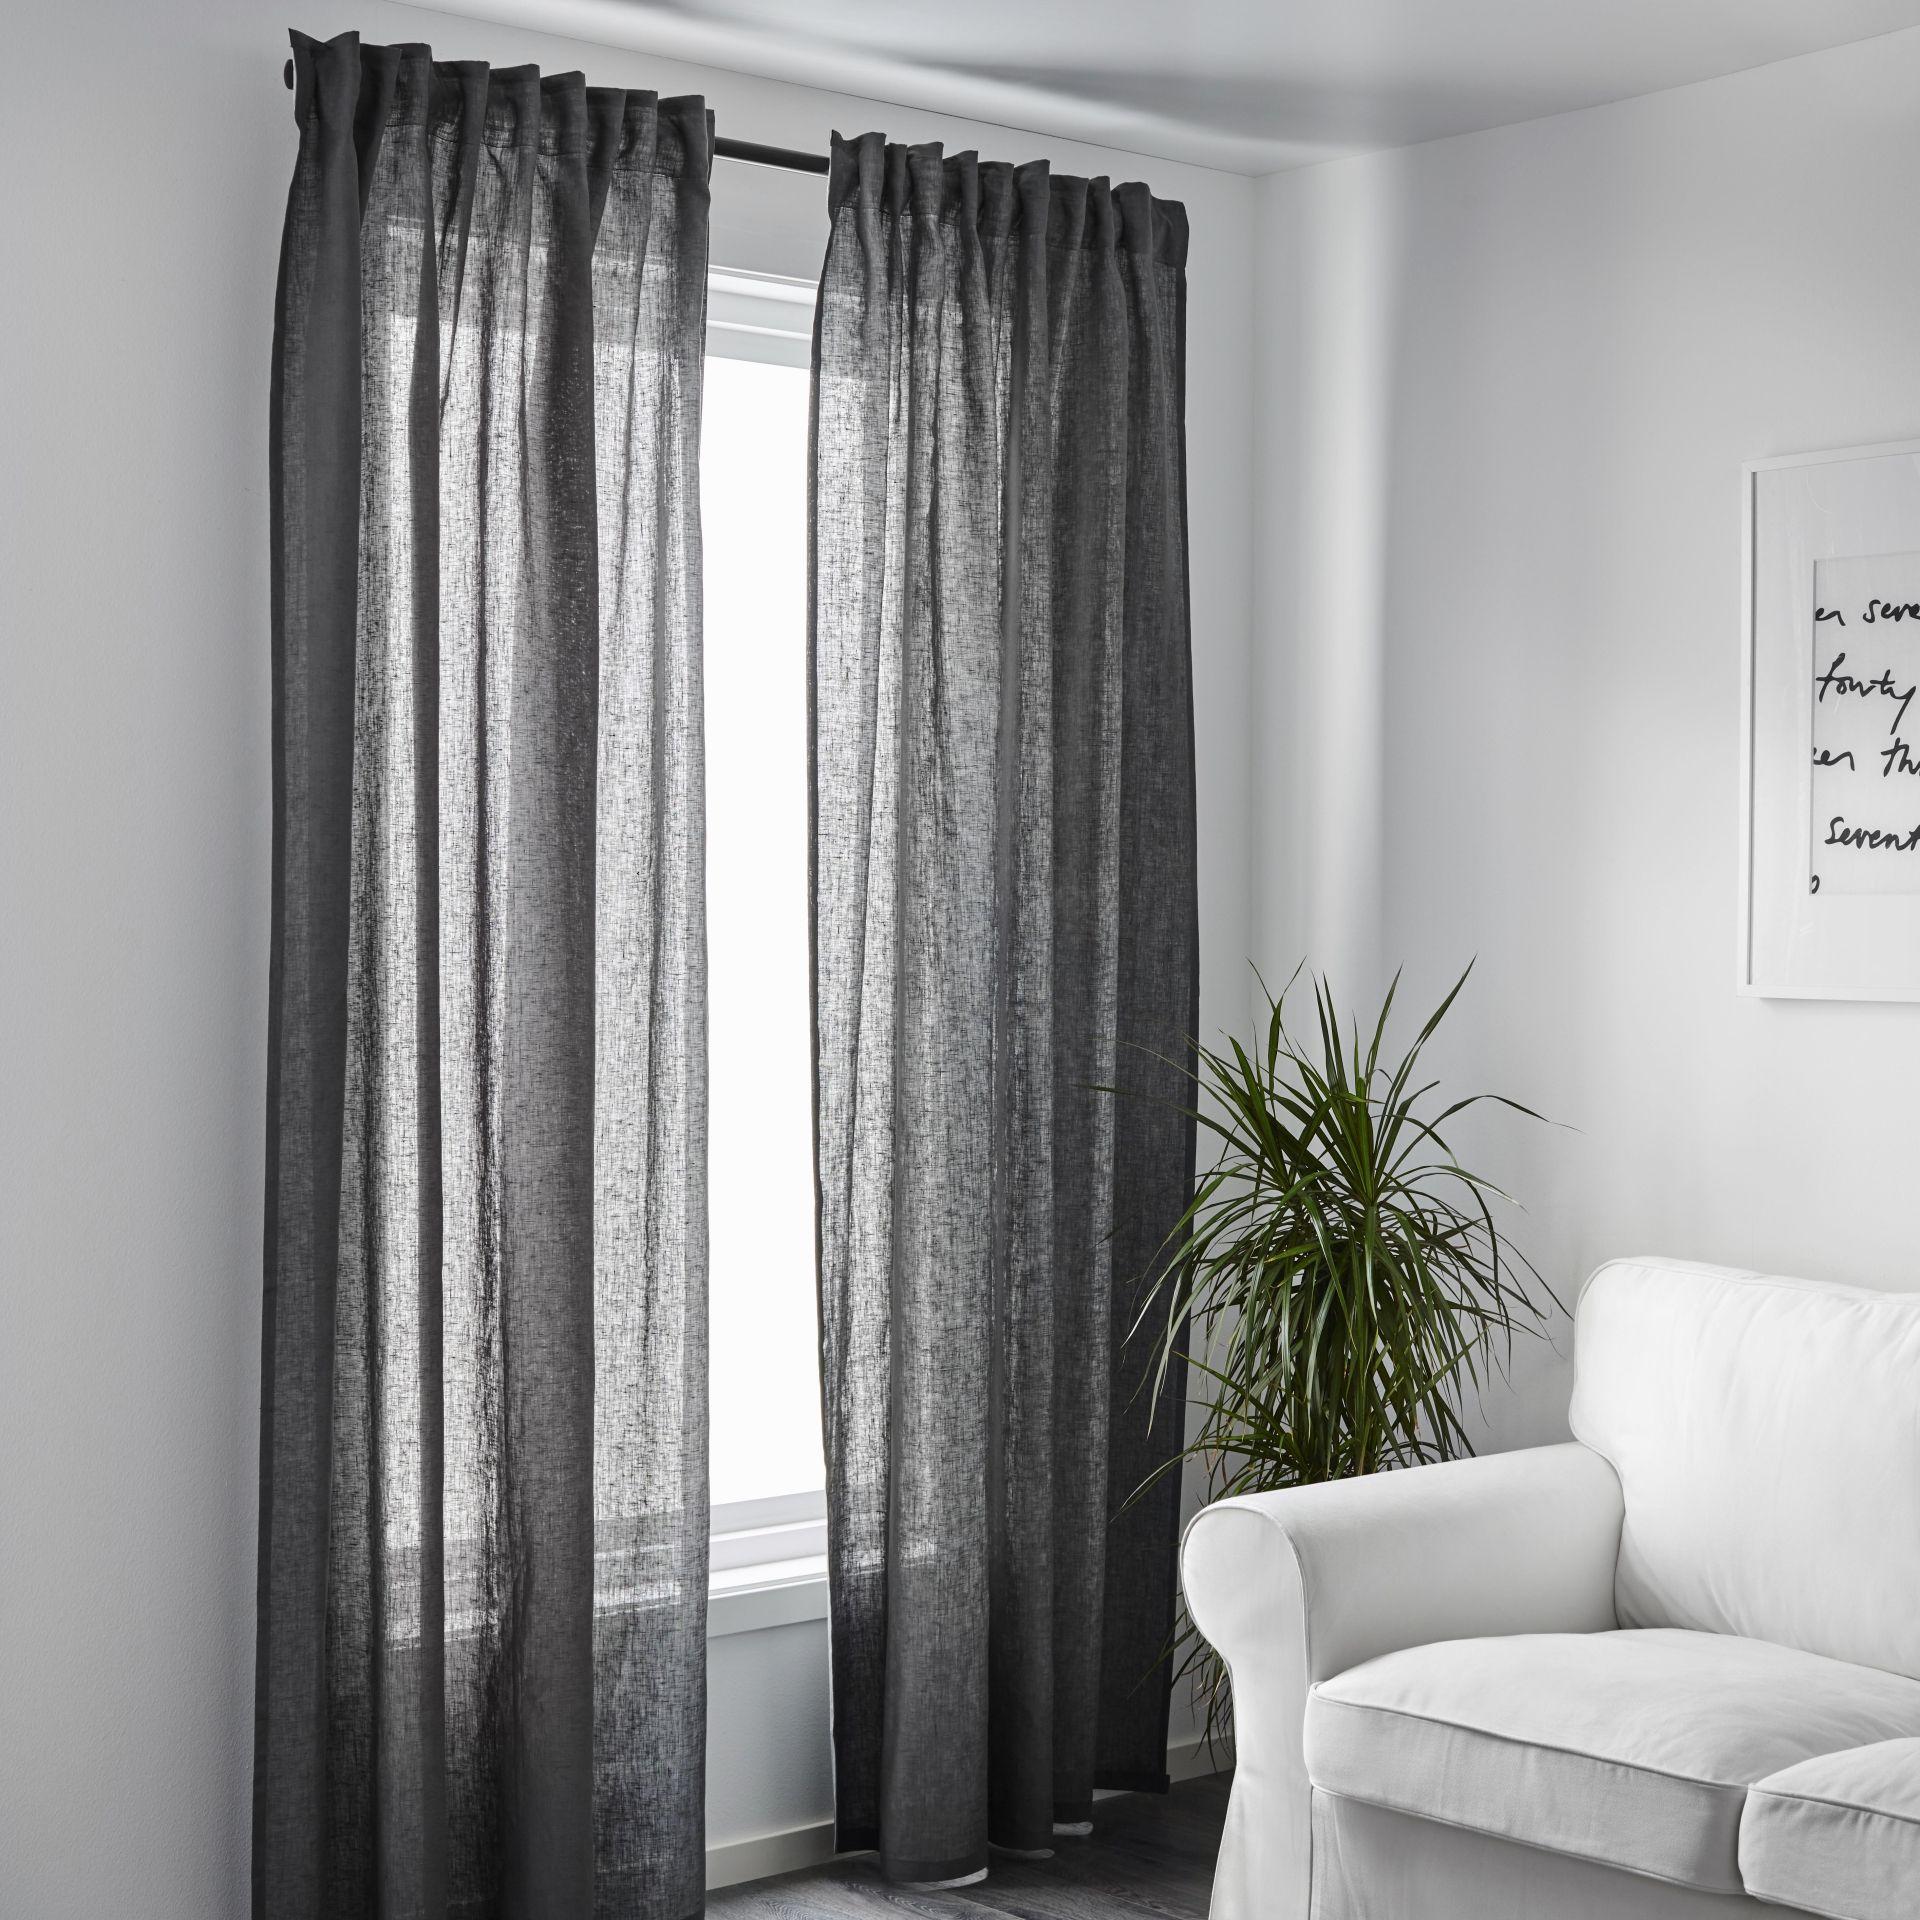 AINA Gordijnen, 1 paar, donkergrijs | Apartments, Catalog and Interiors